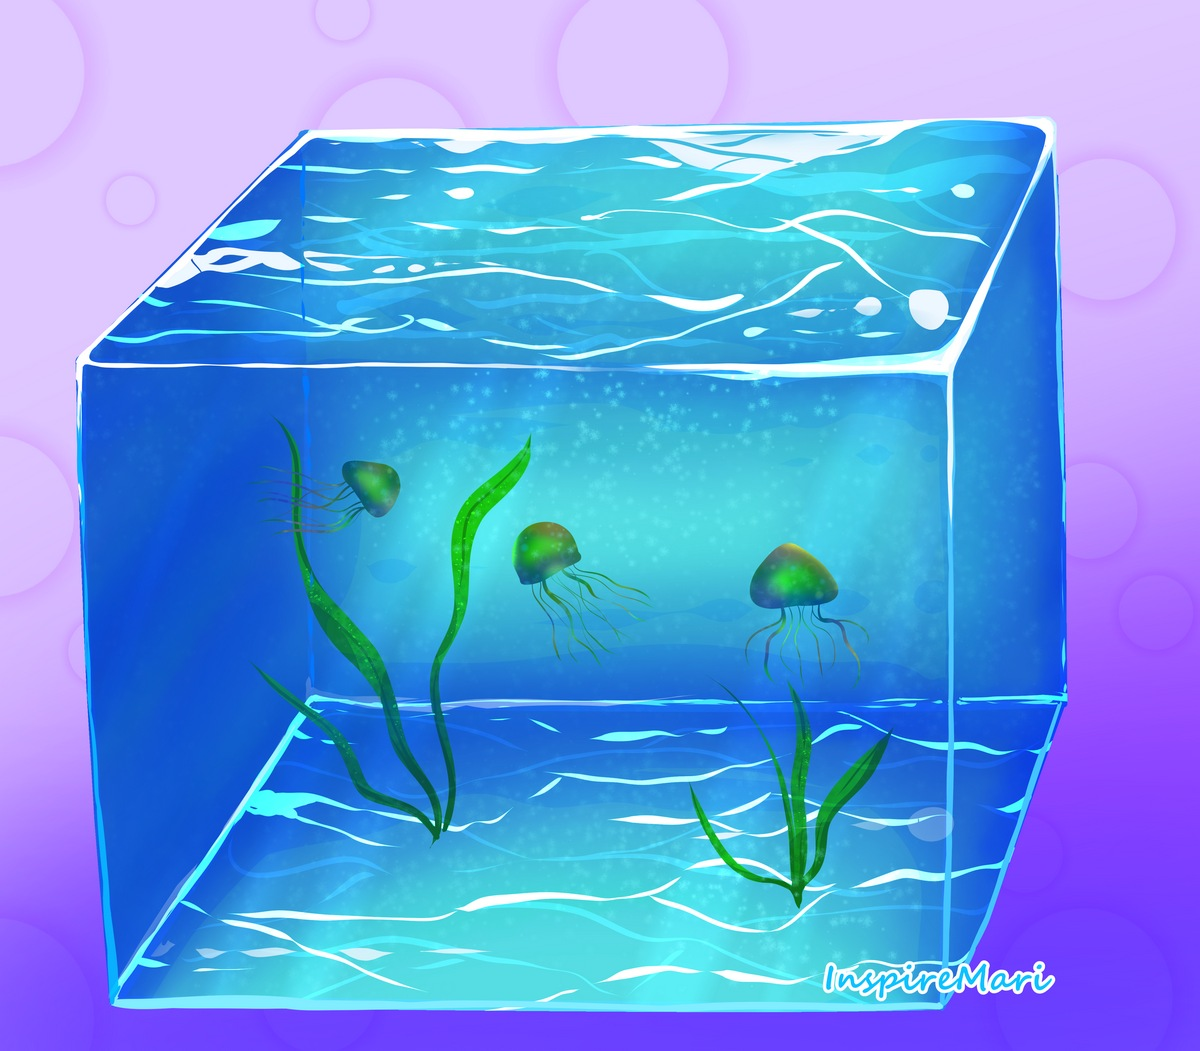 Water Cube with jellyfish art by InspireMari